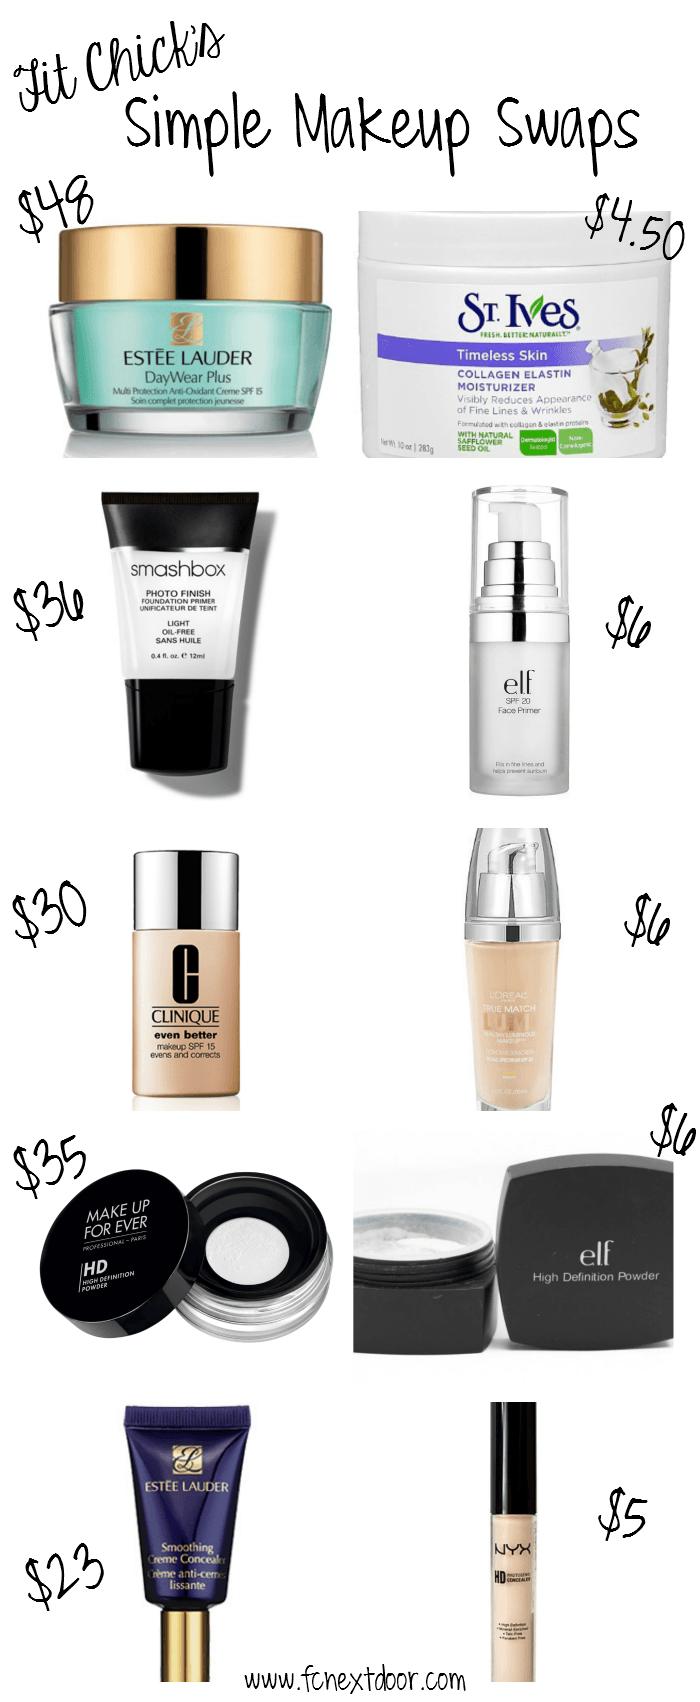 Simple Swaps Makeup Edition Vol 1 Makeup dupes